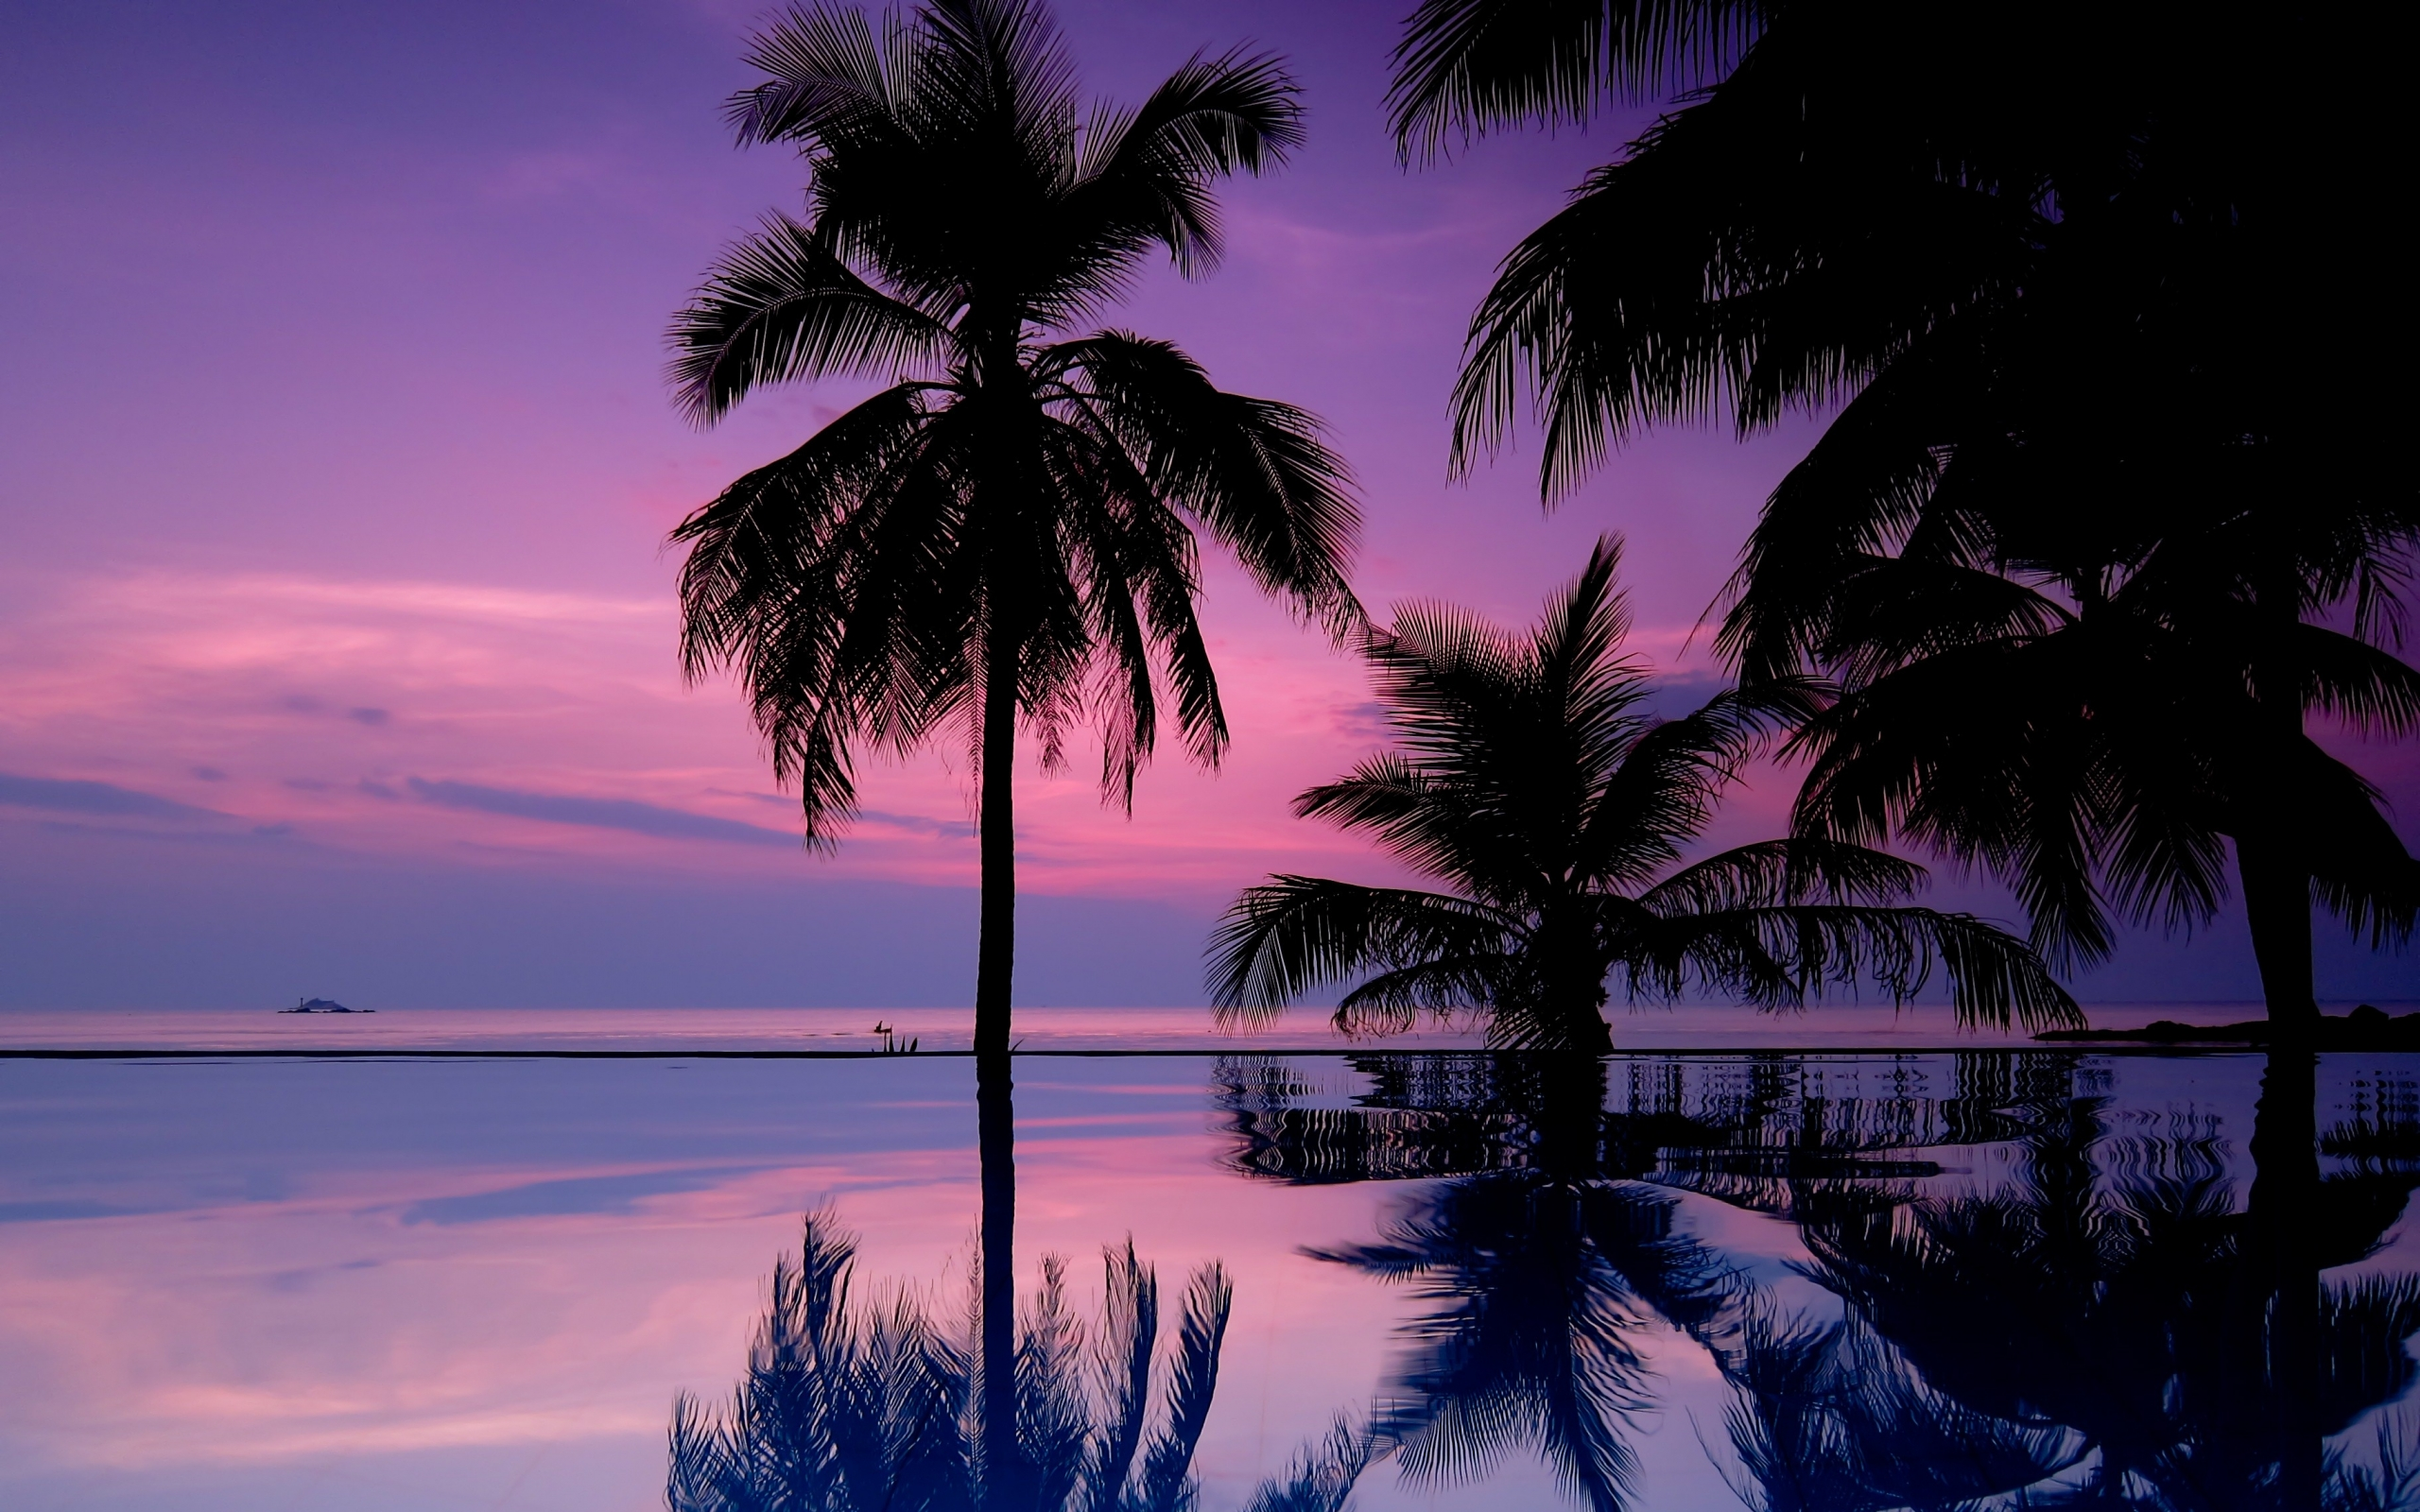 Palm Tree iPhone Wallpaper - WallpaperSafari